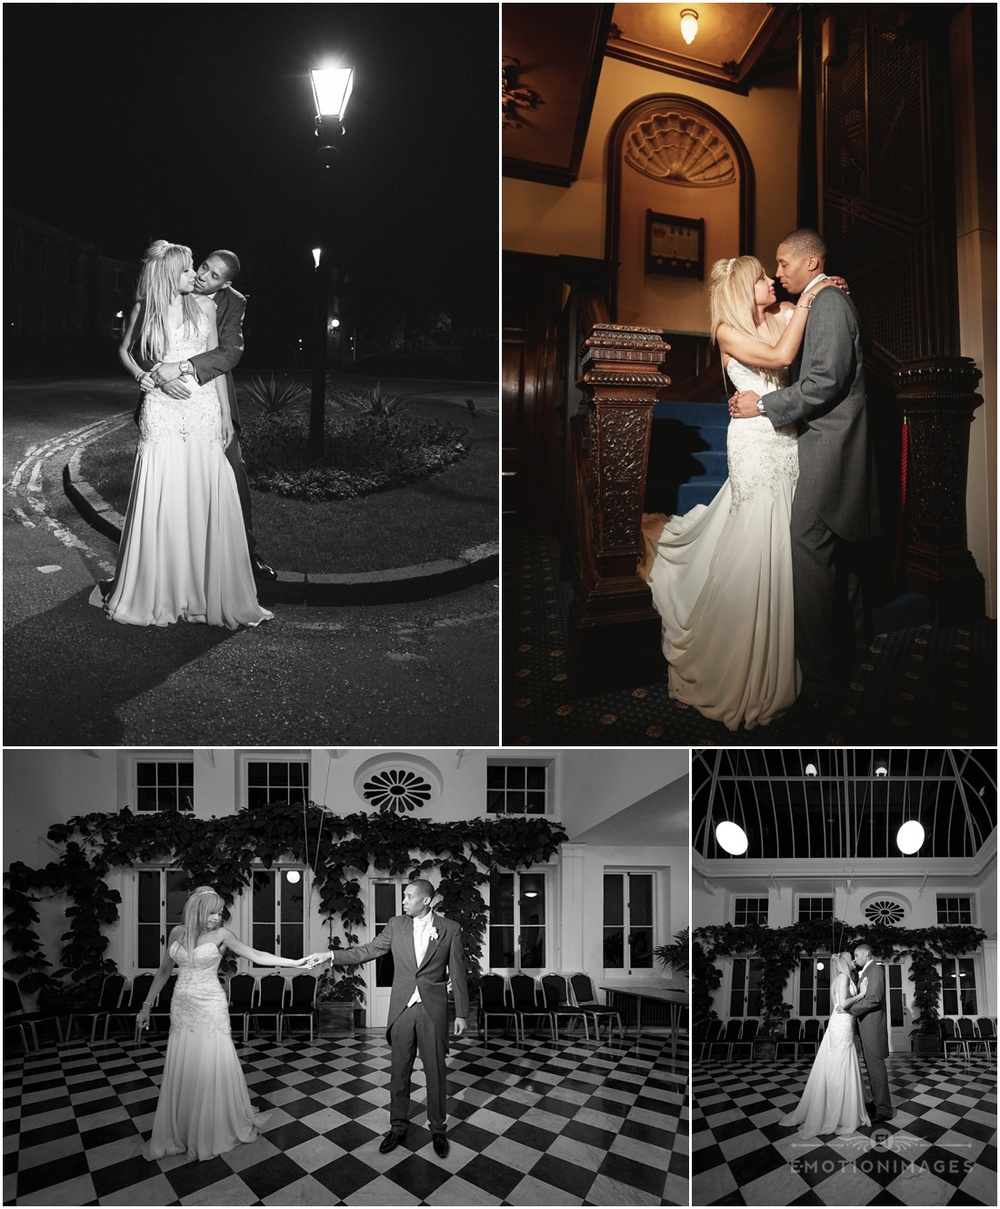 York_House_Twickenham_Wedding_Photography_023.JPG